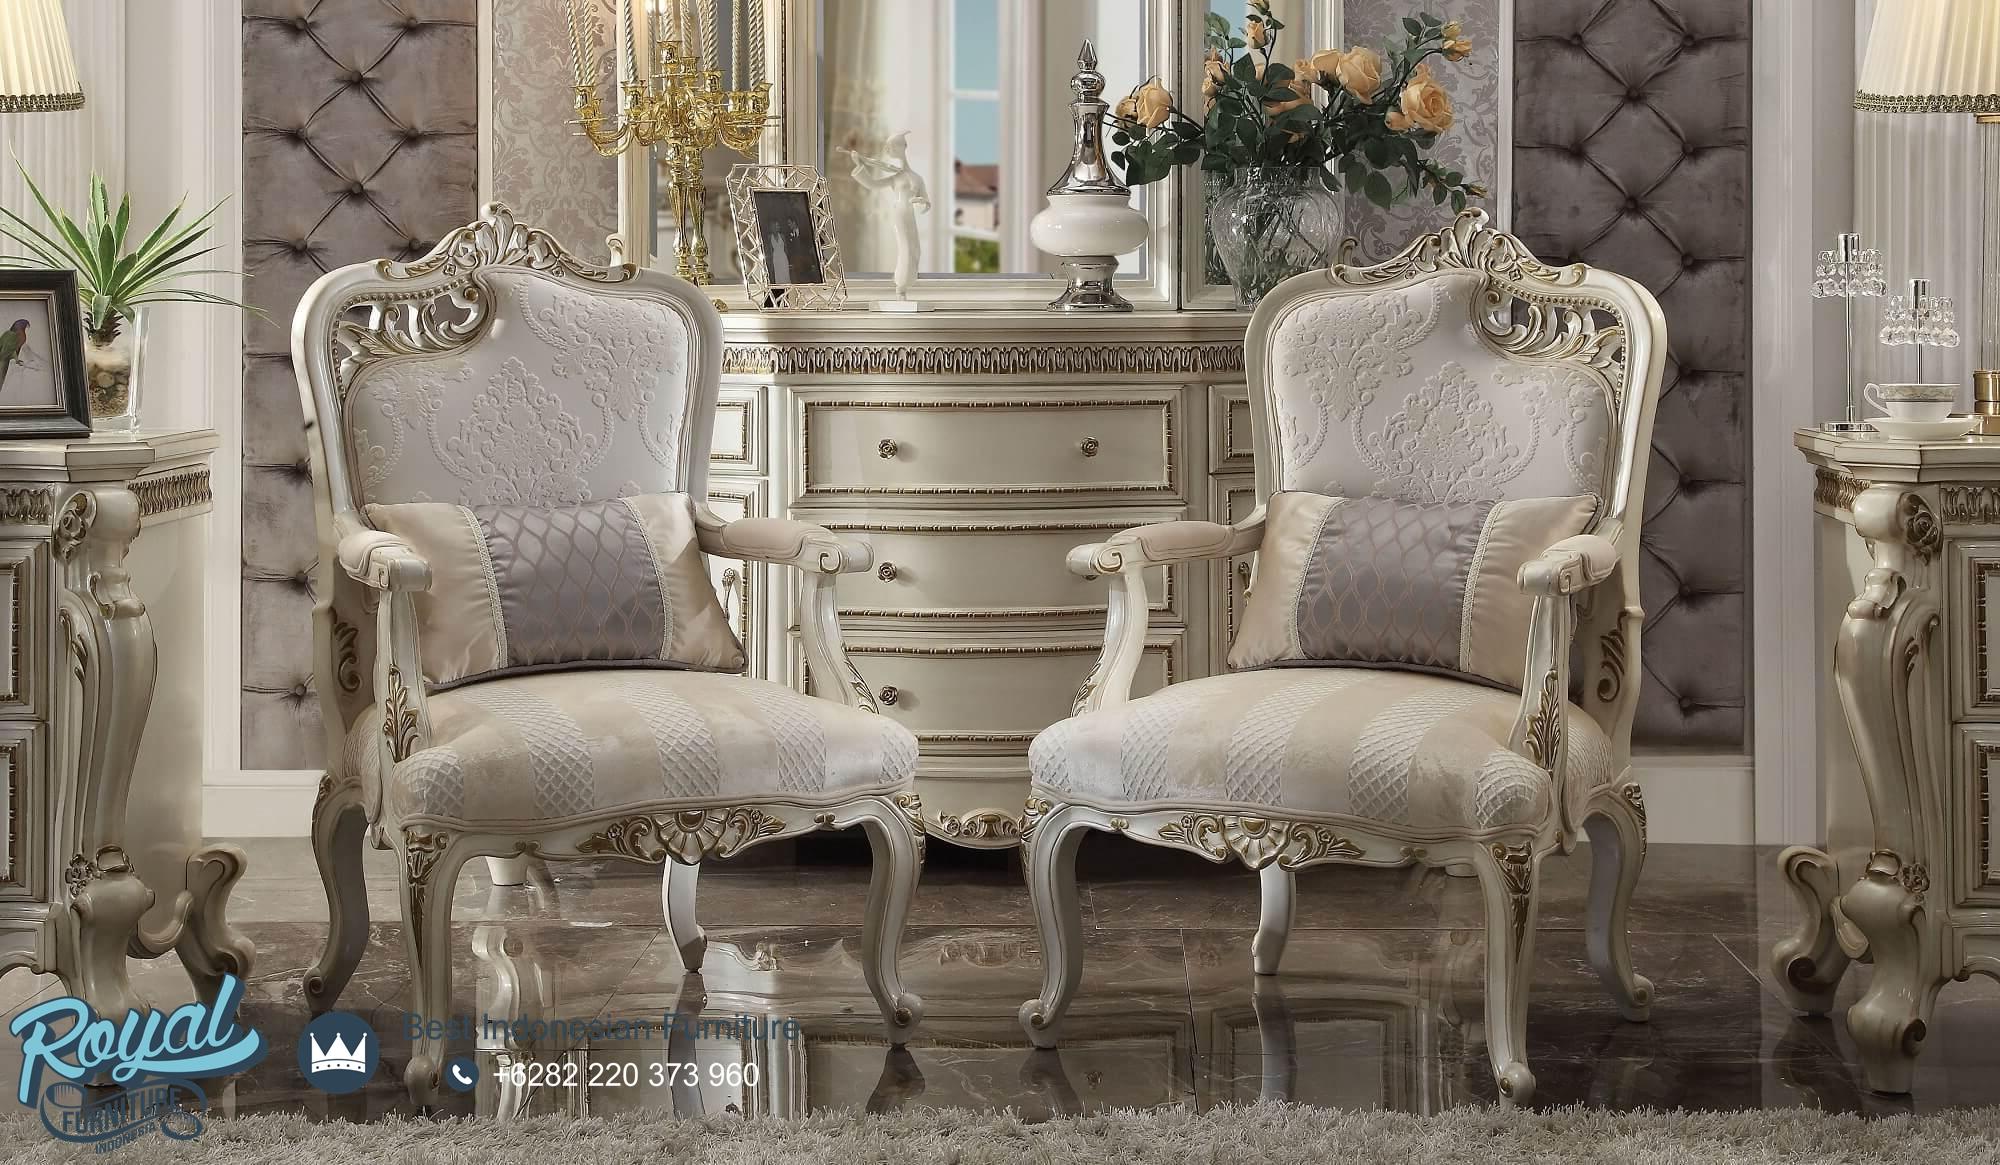 Kursi Tamu Mewah Modern Ukir Jepara Terbaru Antique Pearl, kursi tamu mewah modern, kursi tamu mewah elegan, kursi tamu mewah jati terbaru, sofa tamu mewah terbaru, desain sofa ruang tamu mewah modern, sofa mewah murah, sofa mewah minimalis, sofa mewah kulit asli, model sofa mewah terbaru, model sofa mewah elegan, sofa tamu ukir jepara, sofa tamu jepara terbaru mewah, sofa tamu jepara terbaru, sofa tamu jepara minimalis, sofa tamu jepara warna putih duco, sofa ruang tamu jepara, sofa tamu jati jepara, kursi sofa tamu jepara, sofa tamu ukiran jepara, harga sofa tamu jepara murah, sofa jepara, harga sofa tamu jepara, sofa mewah, sofa kayu jati ukir, kursi tamu jepara terbaru, furniture mewah, furniture kayu jati, furniture kayu, mebel minimalis, jati jepara,jepara furniture, mebel jati jepara, ukir jepara, mebel jepara, royal furniture jepara